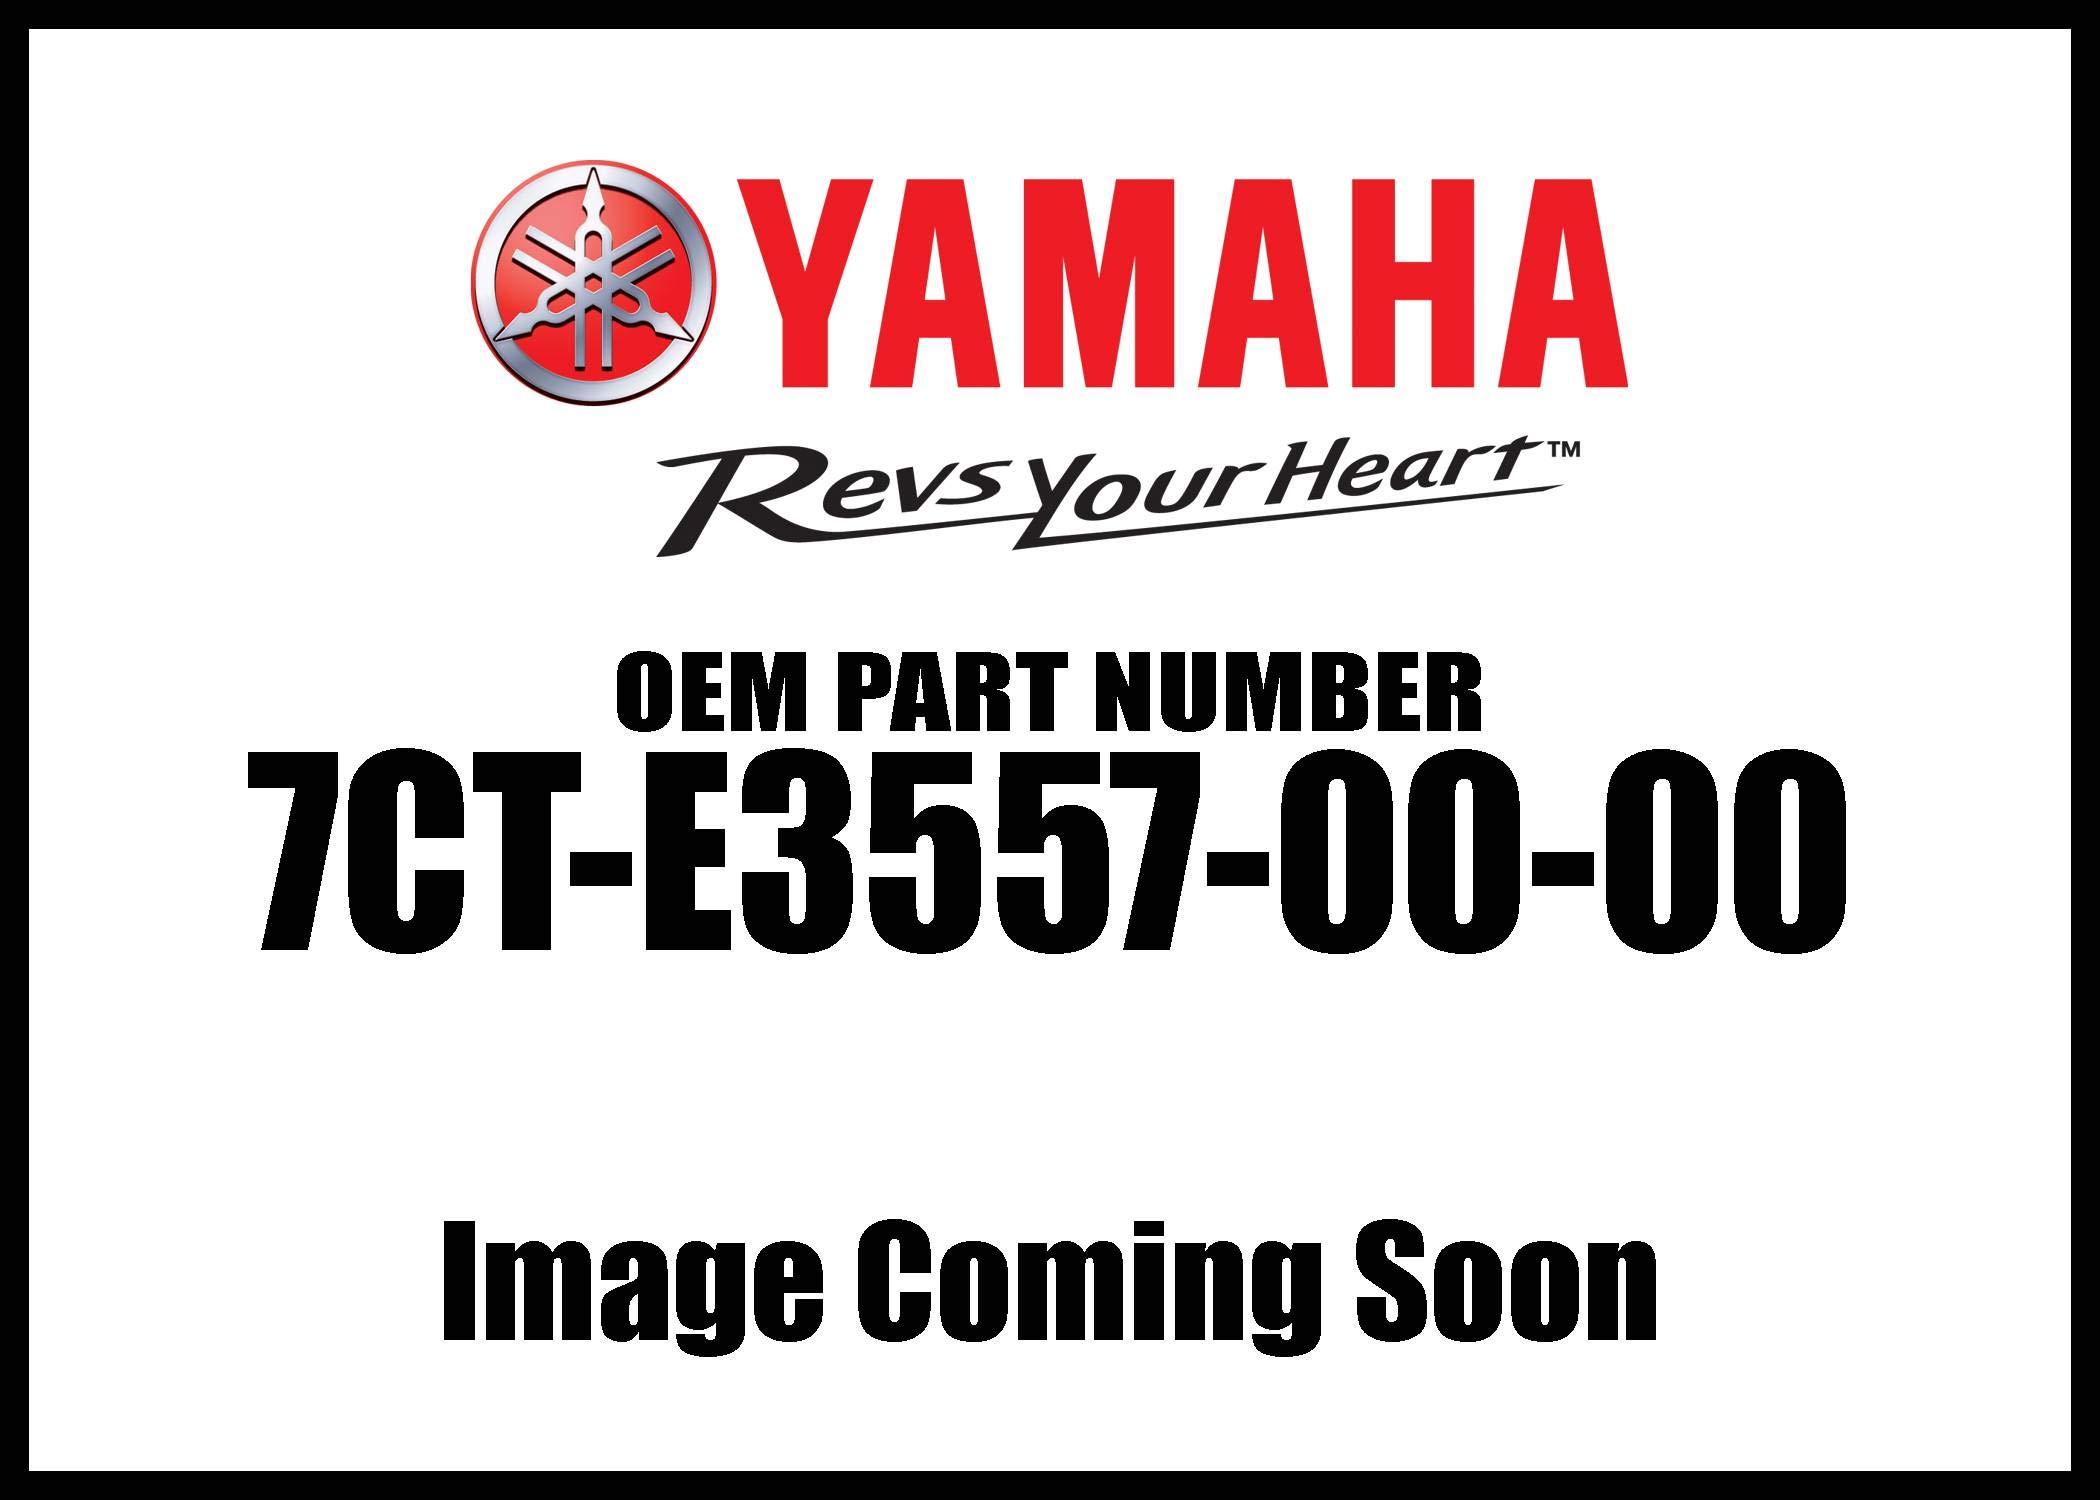 Yamaha 7CT-E3557-00-00 GASKET; 7CTE35570000